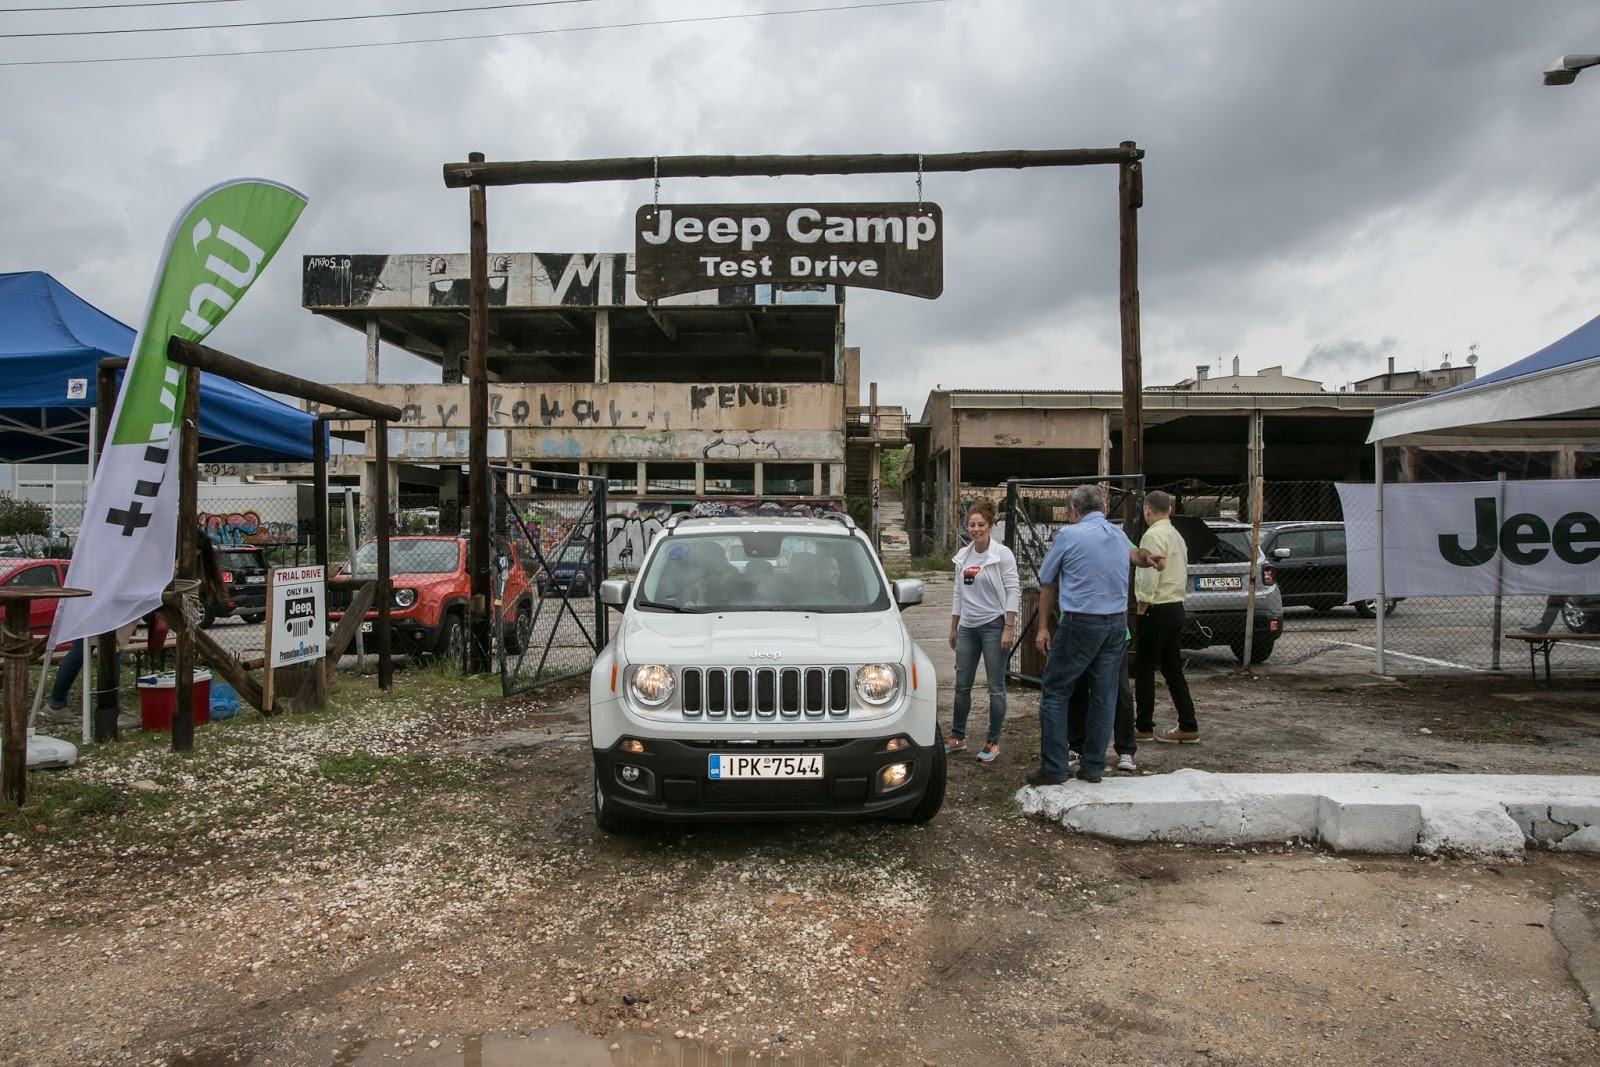 JEEP%2BCAMP GK 0239 Πετάμε ένα Jeep Renegade σε λάσπες, πέτρες, άμμο, λίμνες. Θα τα καταφέρει; Jeep, Jeep Renegade, Renegade, SUV, TEST, zblog, ΔΟΚΙΜΕΣ